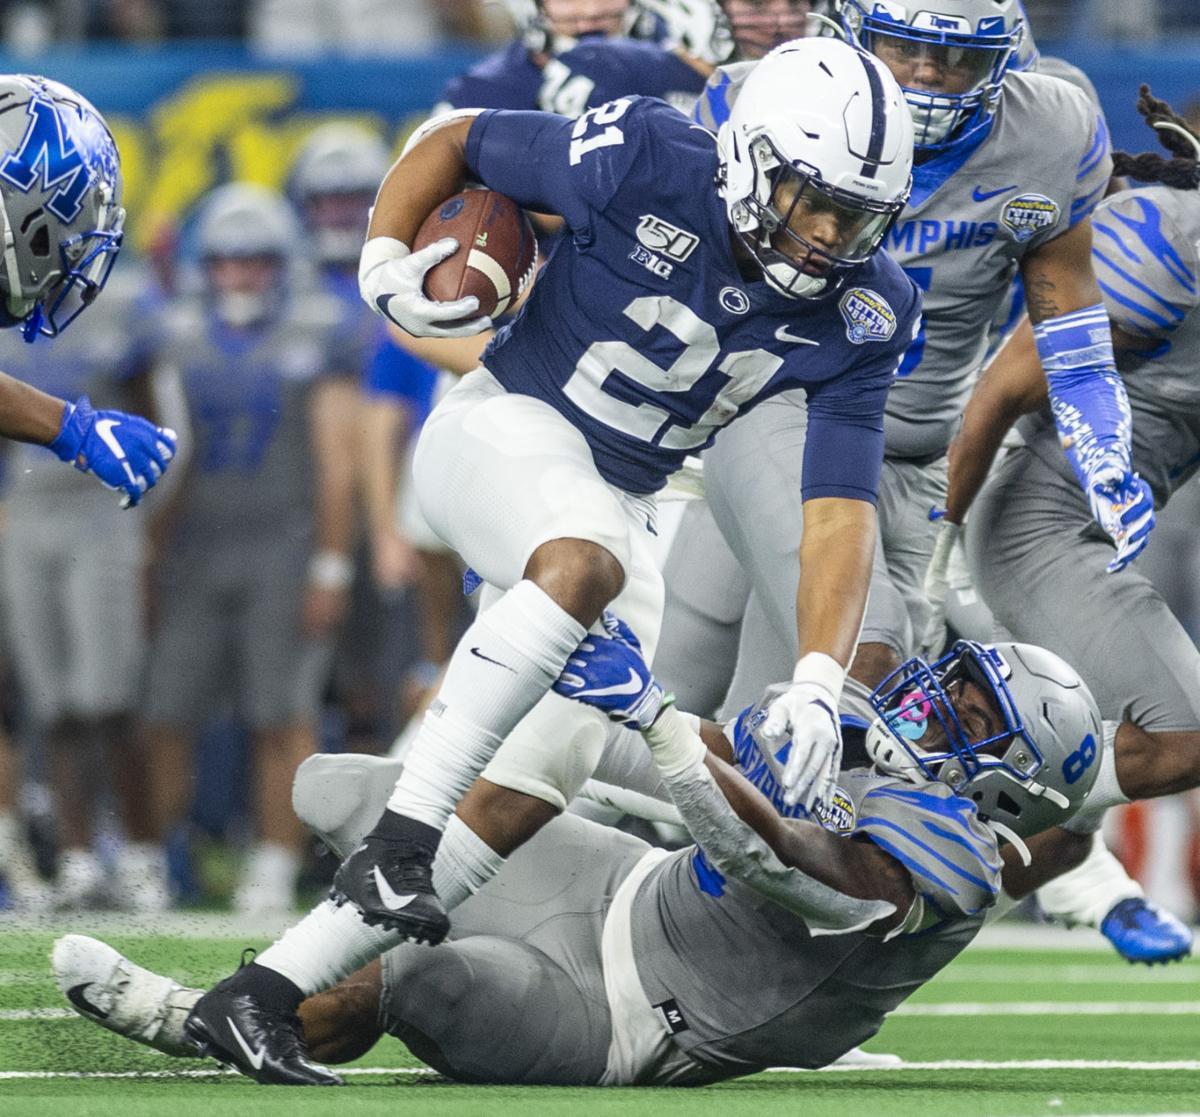 Cotton Bowl Classic, Penn State vs Memphis, Running back Noah Cain (21)